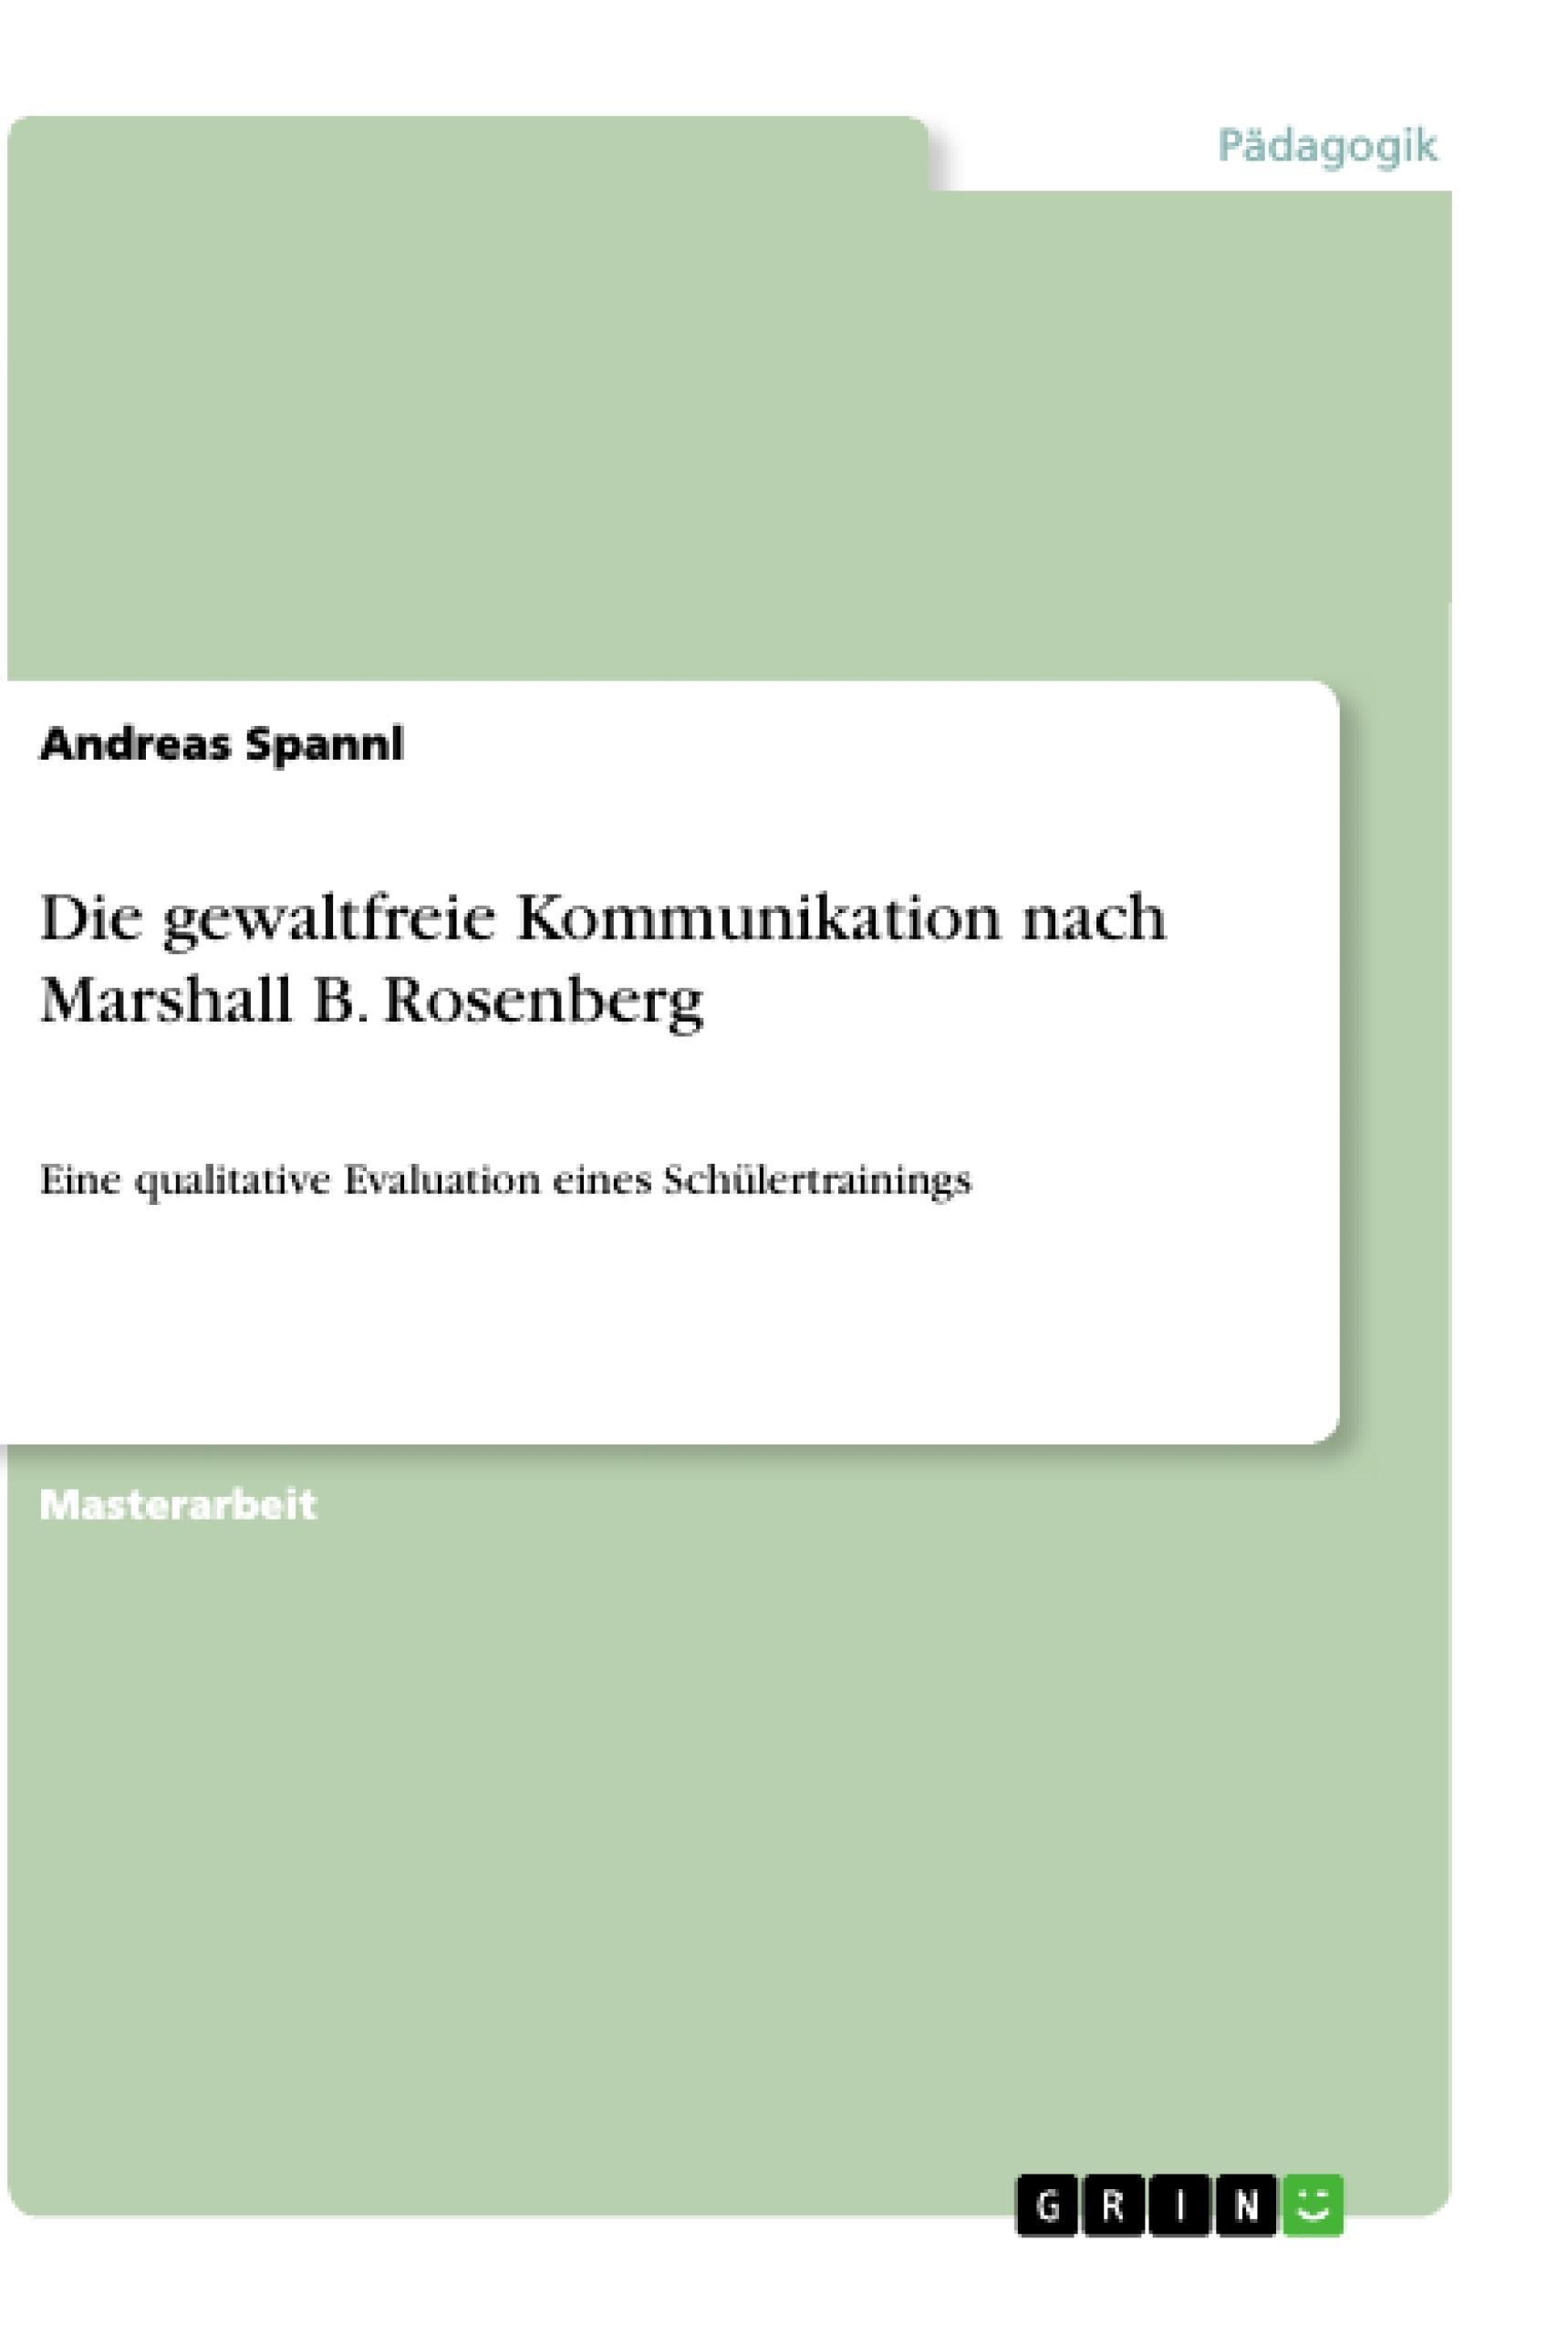 Titel: Die gewaltfreie Kommunikation nach Marshall B. Rosenberg